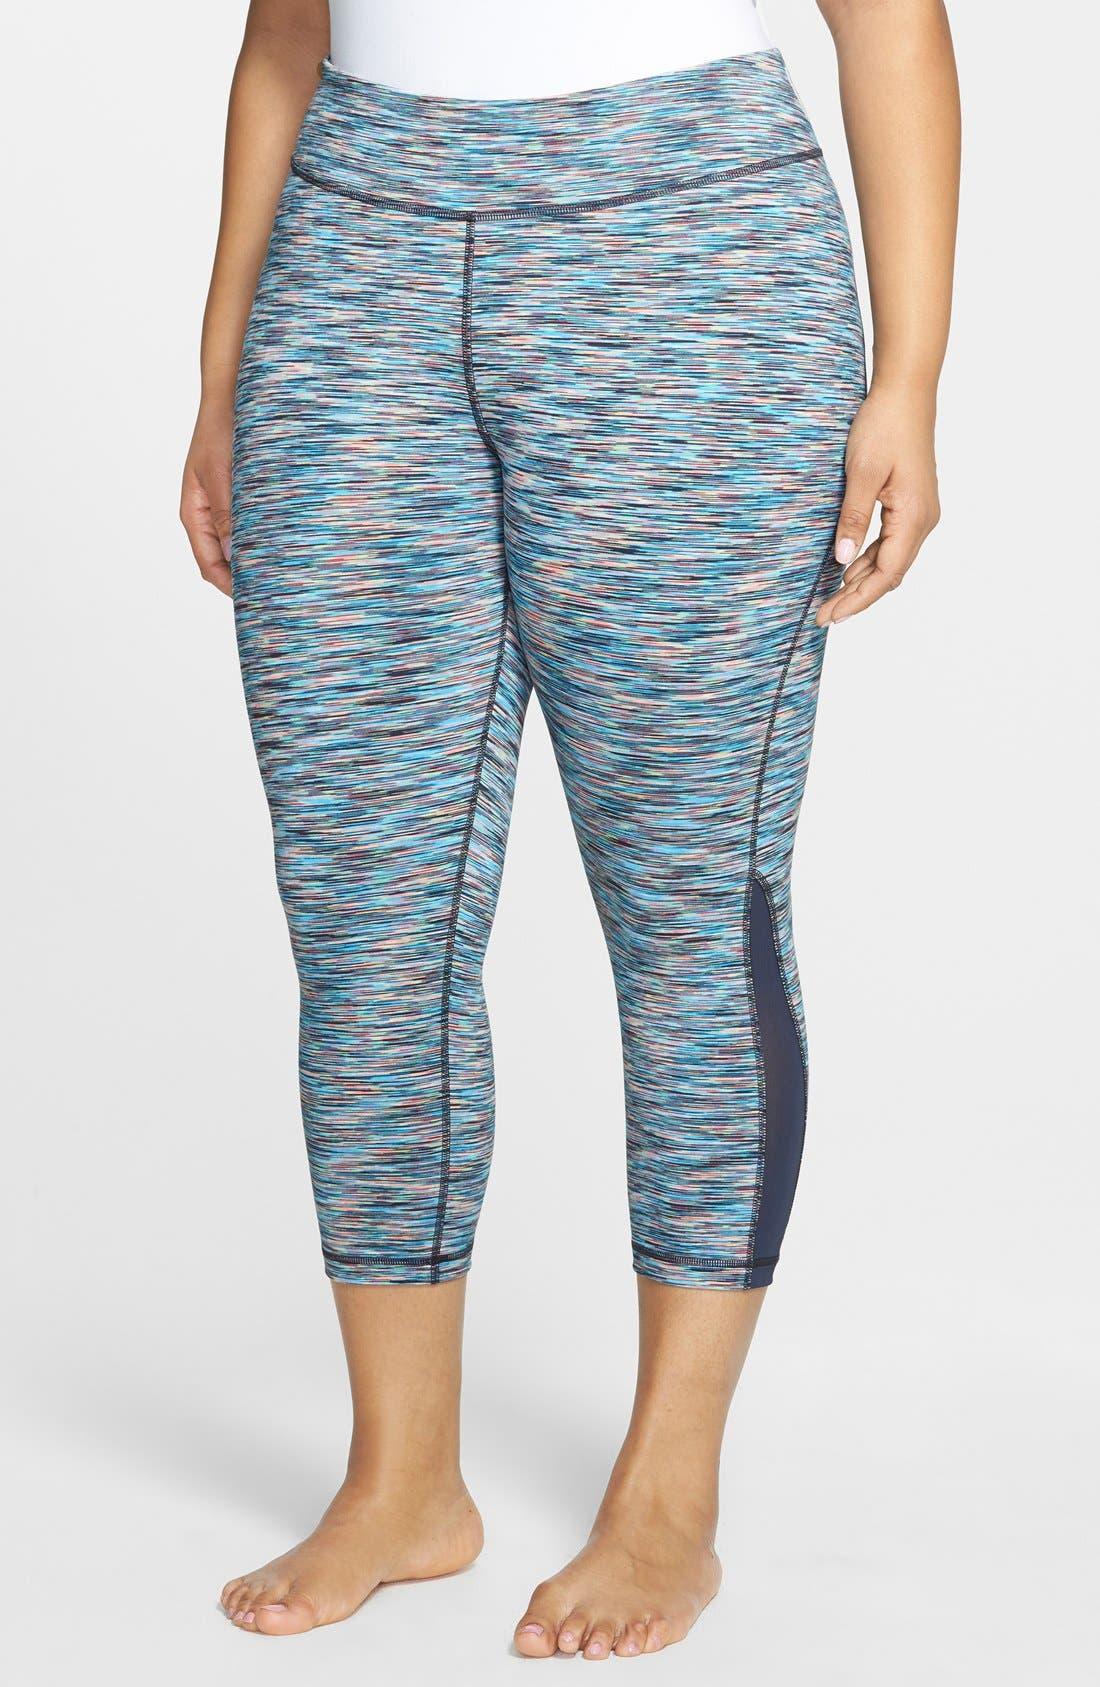 Main Image - Zella 'Streamline' Slim Fit Capri Leggings (Plus Size)